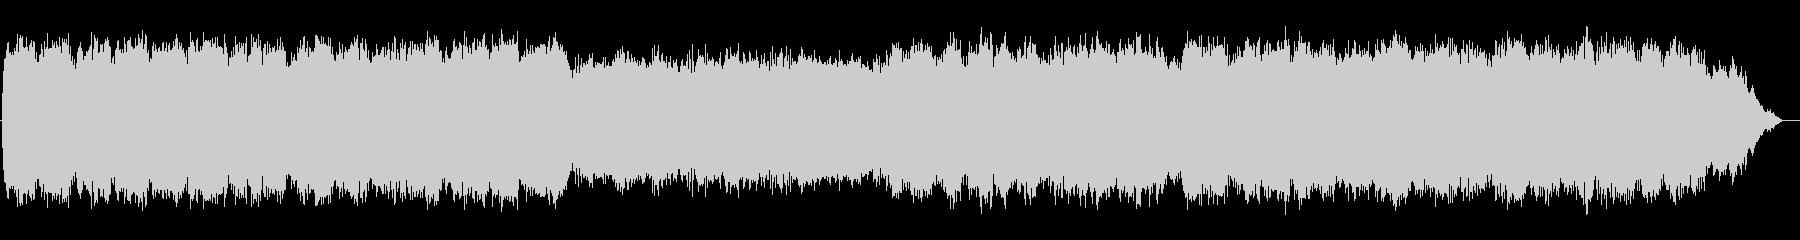 Lyrical flute melody's unreproduced waveform